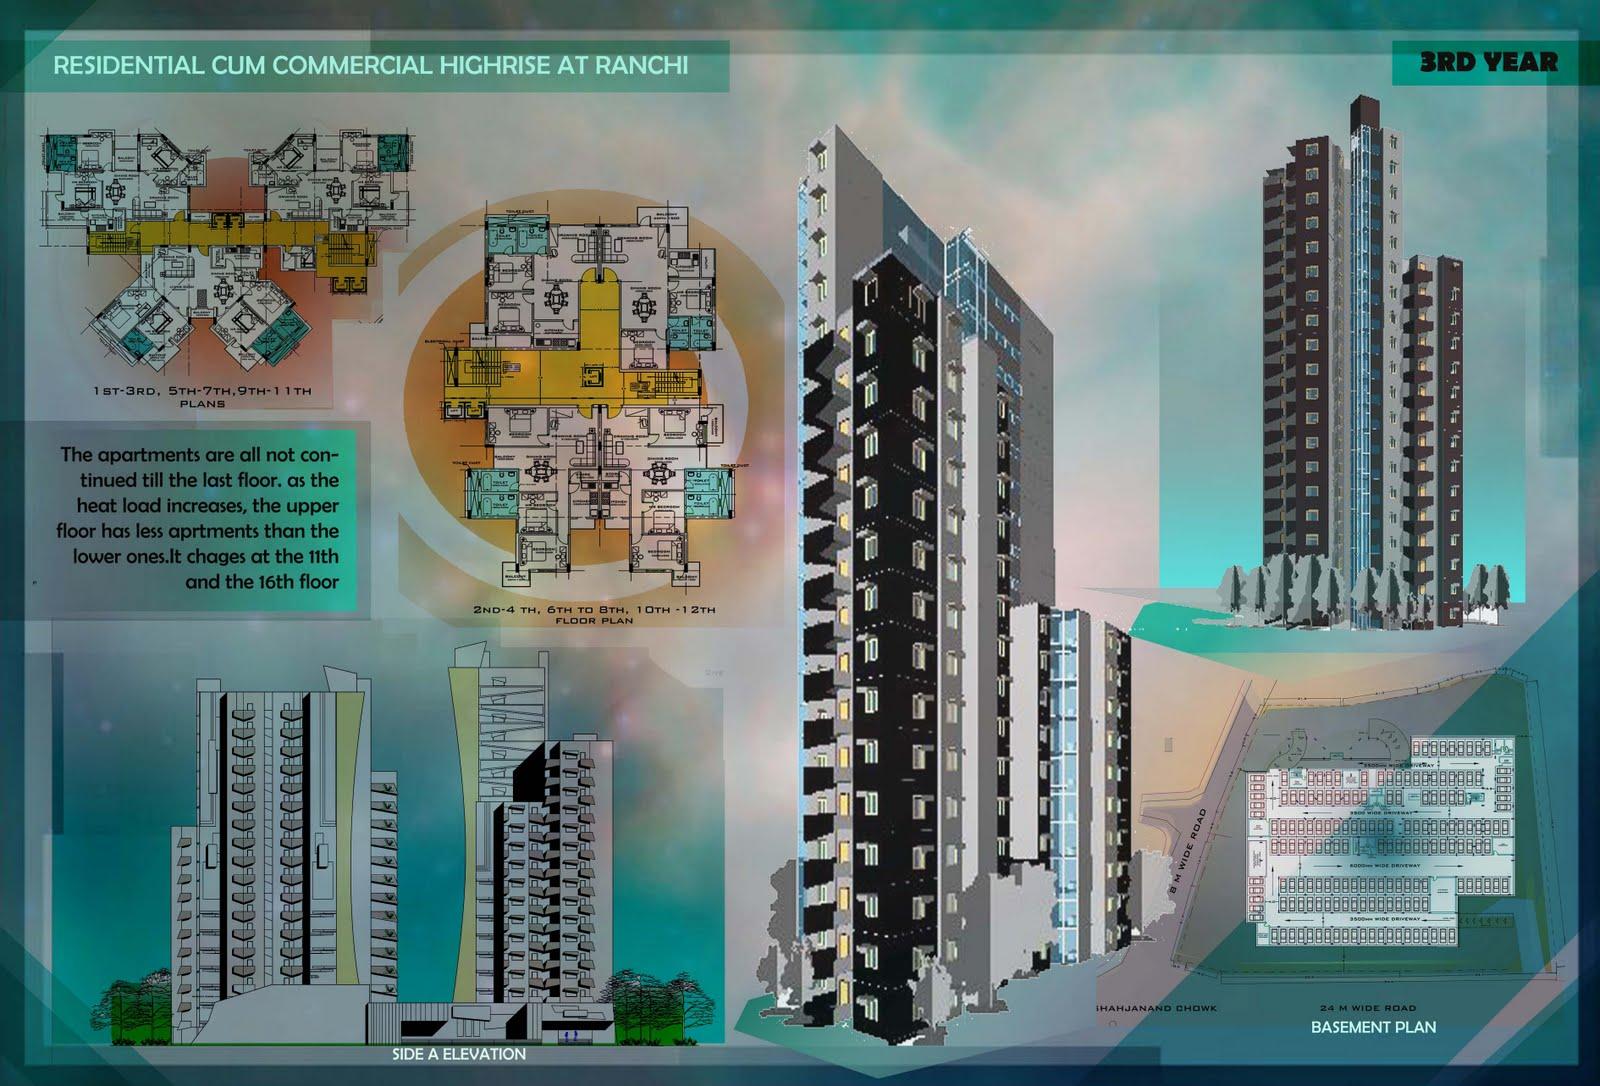 RadicaL_DesignS: Residential cum Commercial Complex@ Ranchi